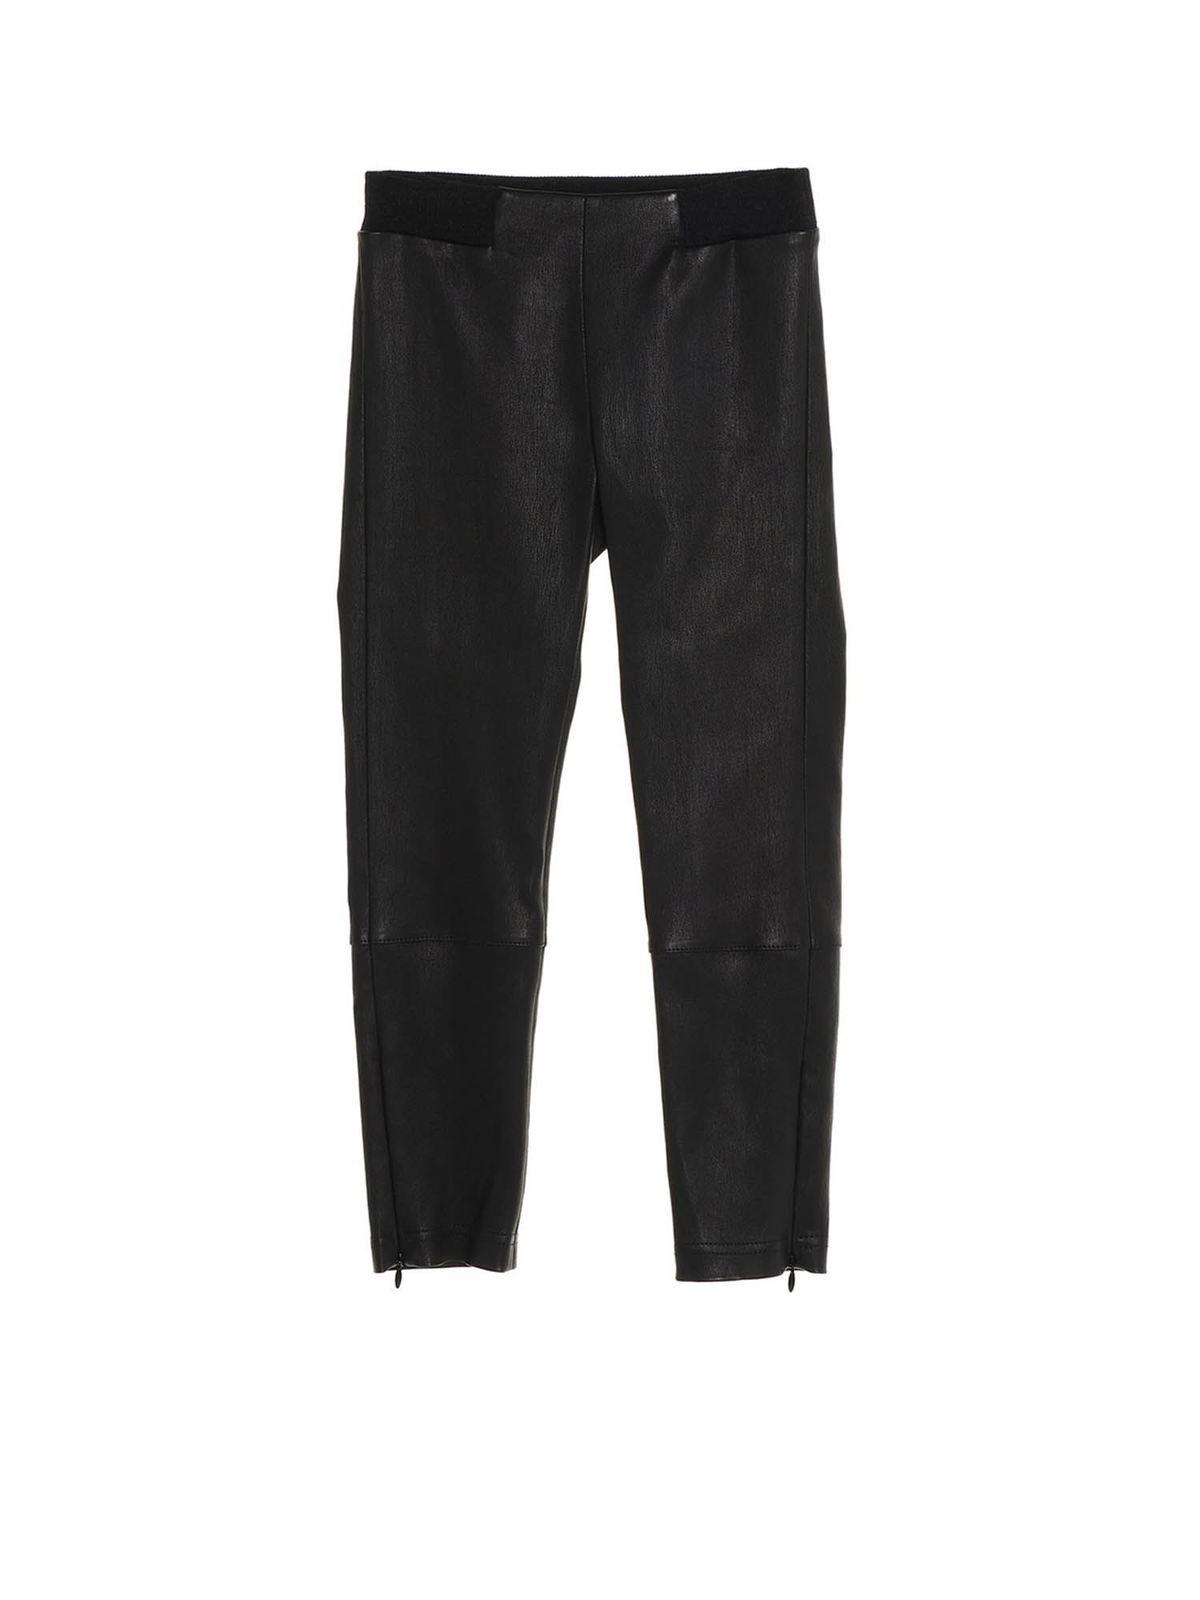 Brunello Cucinelli STRETCH LEATHER LEGGINGS IN BLACK